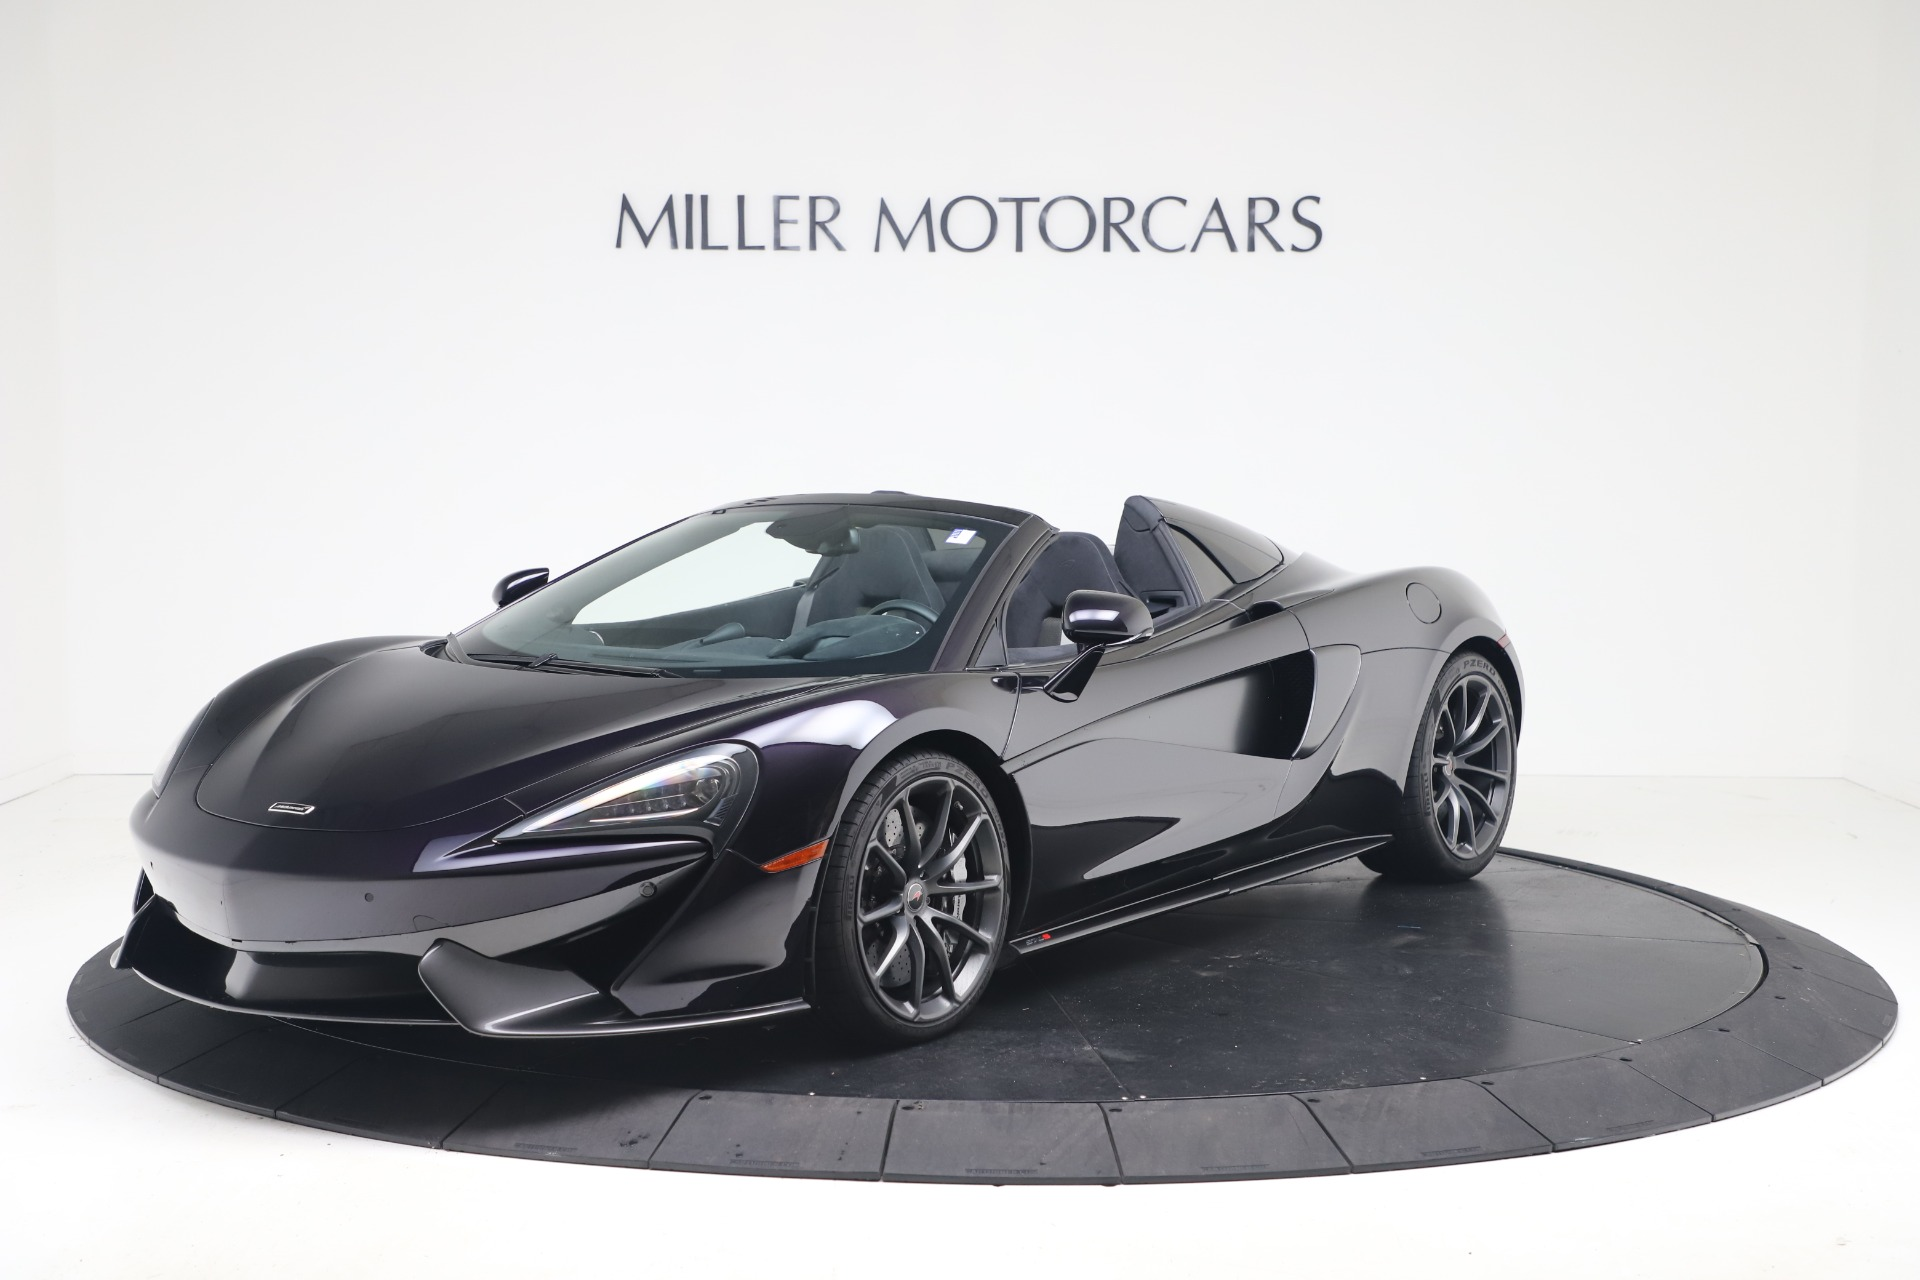 Used 2019 McLaren 570S Spider for sale $186,900 at McLaren Greenwich in Greenwich CT 06830 1